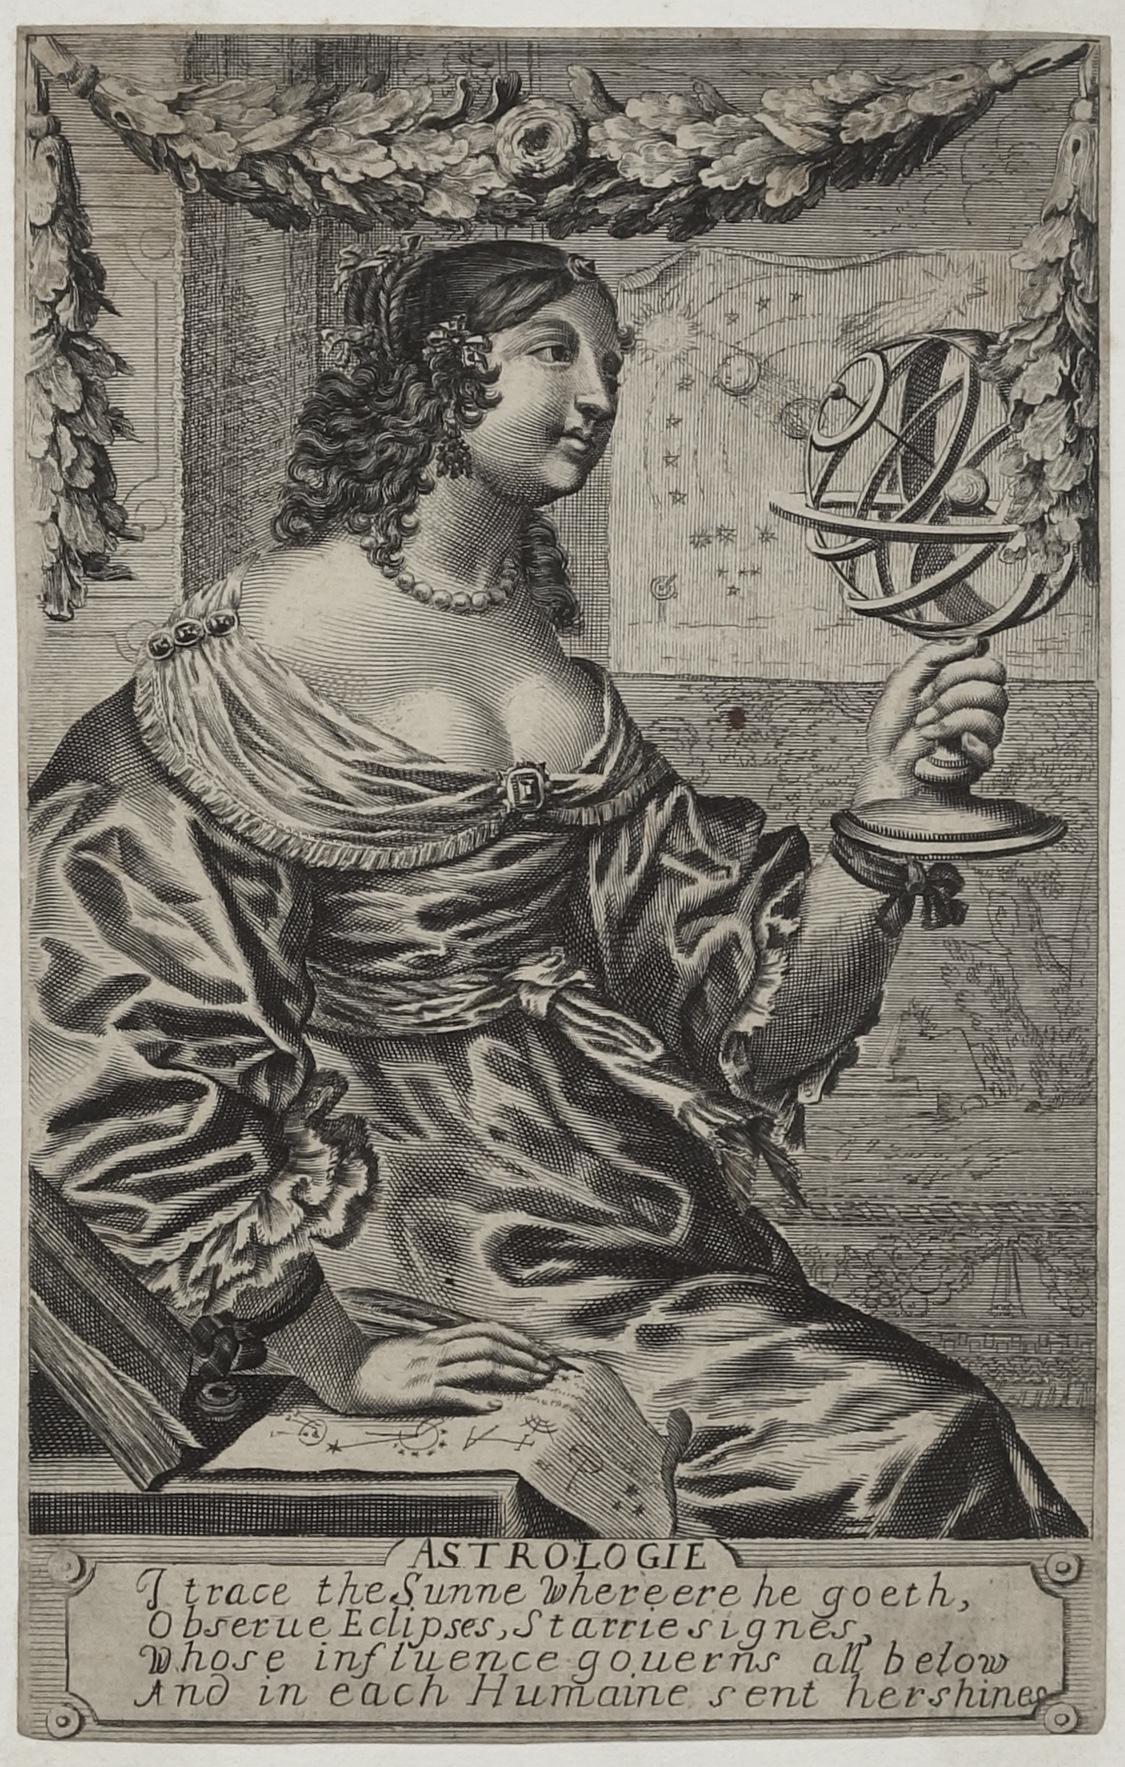 ENGLISH SCHOOL OF THE 17th CENTURY